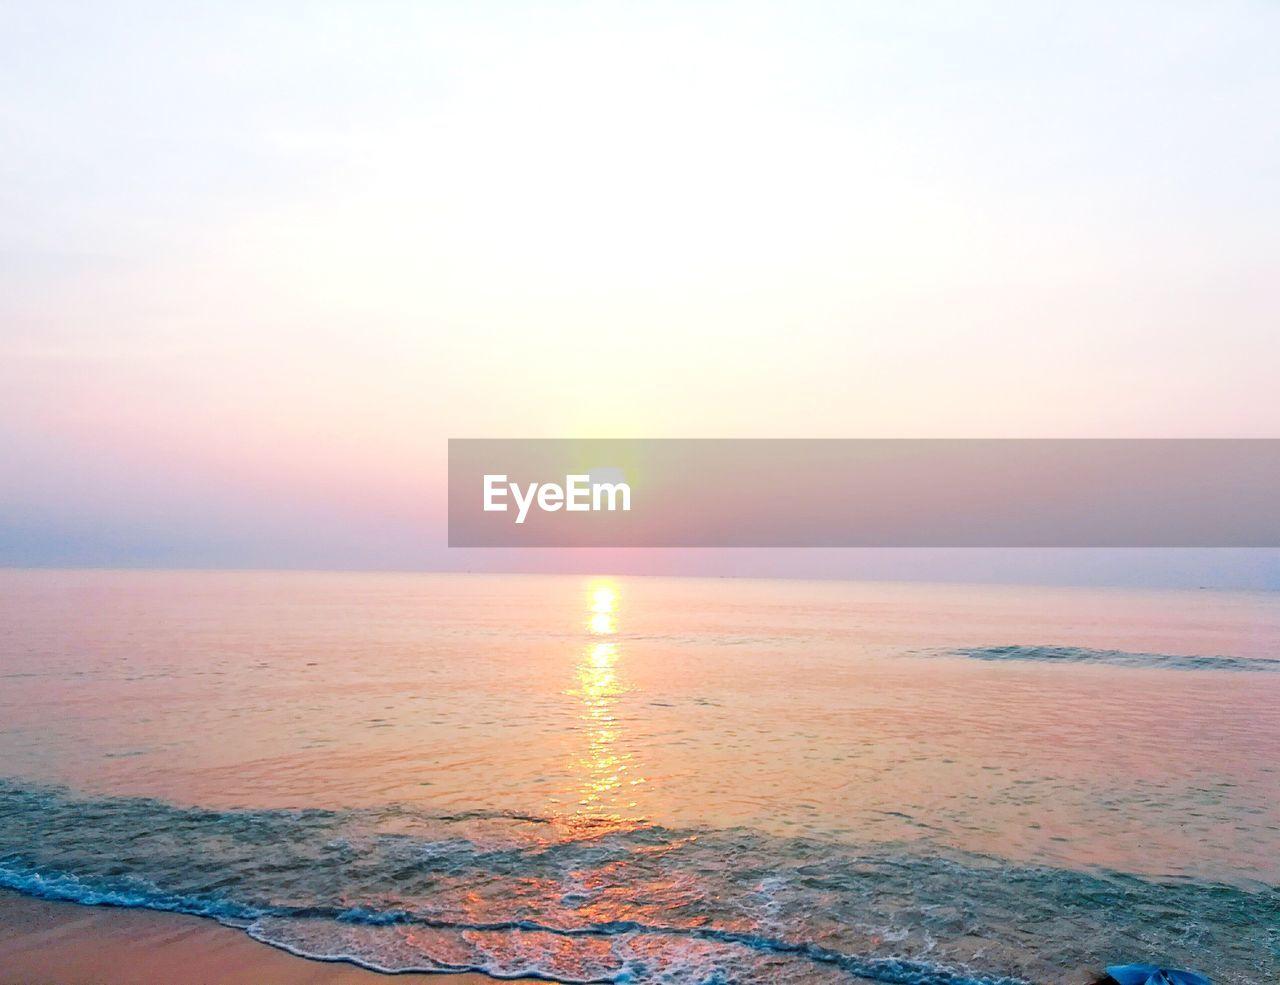 sky, sea, water, scenics - nature, beauty in nature, sunset, horizon, horizon over water, tranquility, sun, tranquil scene, idyllic, orange color, nature, beach, non-urban scene, waterfront, no people, sunlight, outdoors